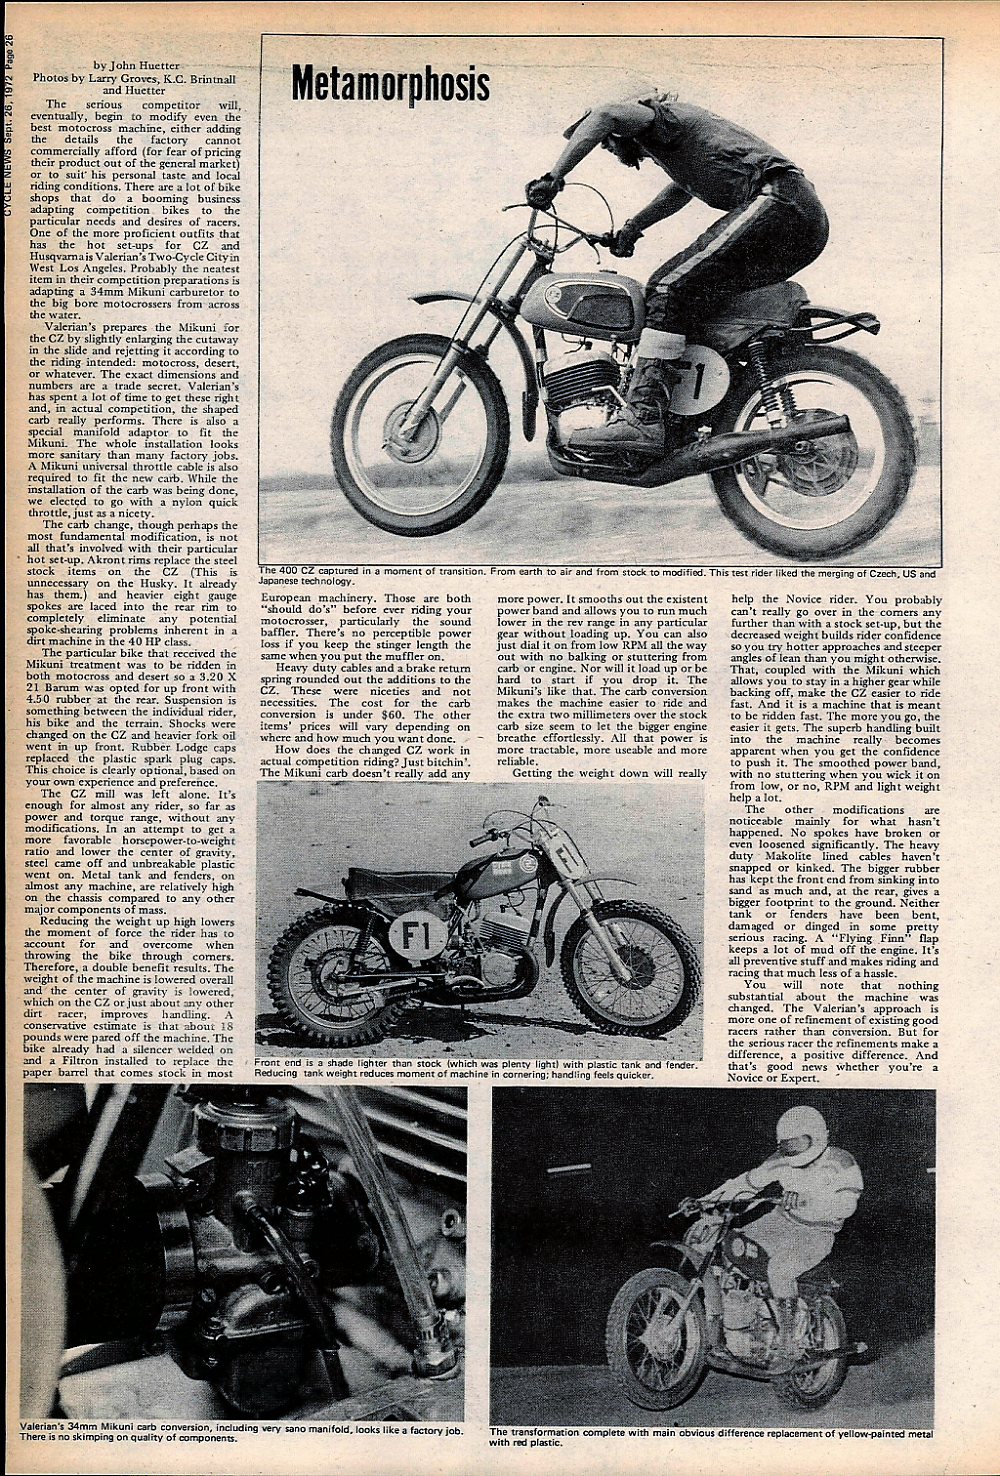 1972 Modified CZ 400 road test  — Ye Olde Cycle Shoppe